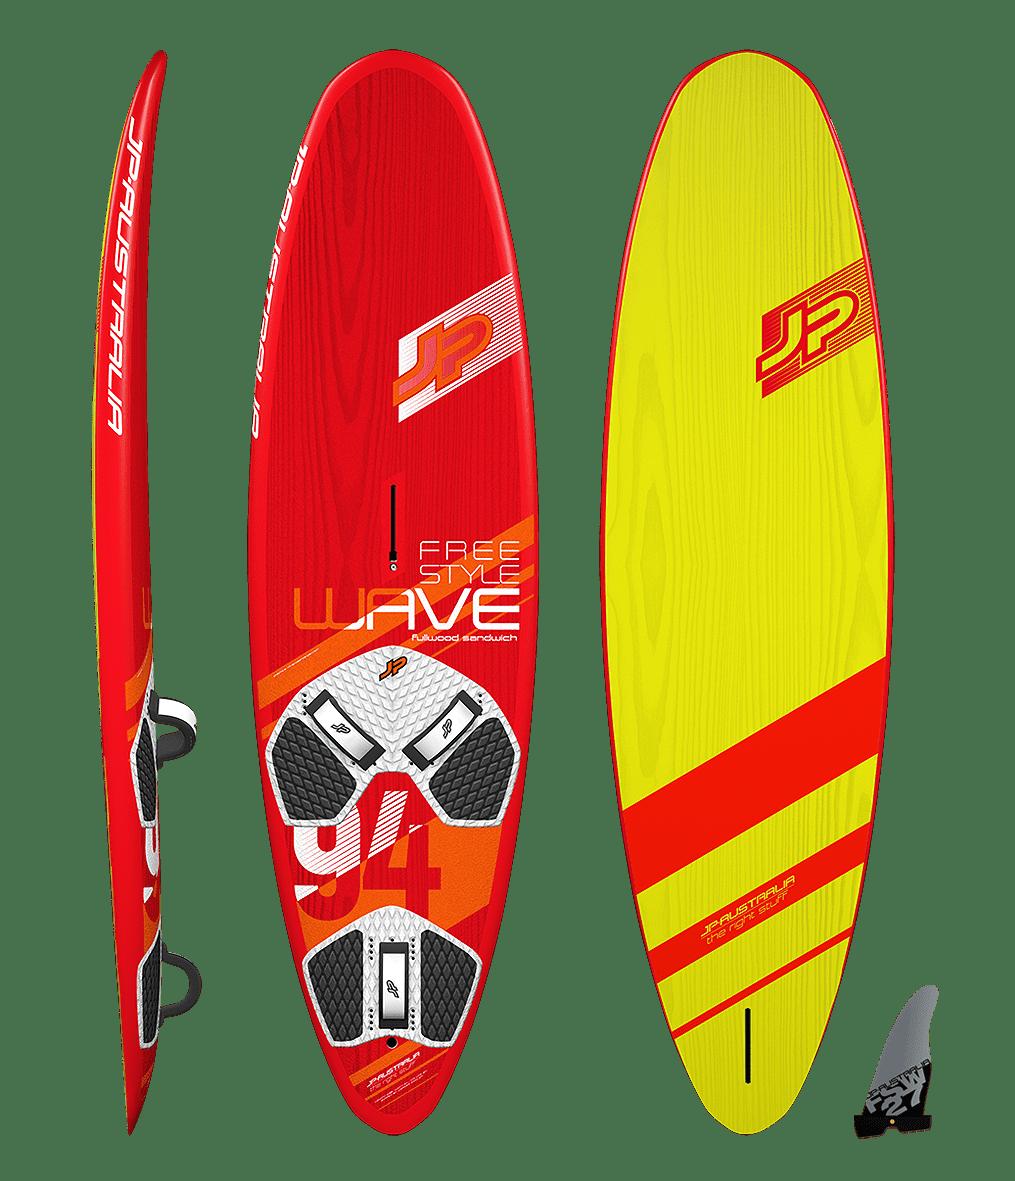 JP Australia Freestyle Wave FWS 2019